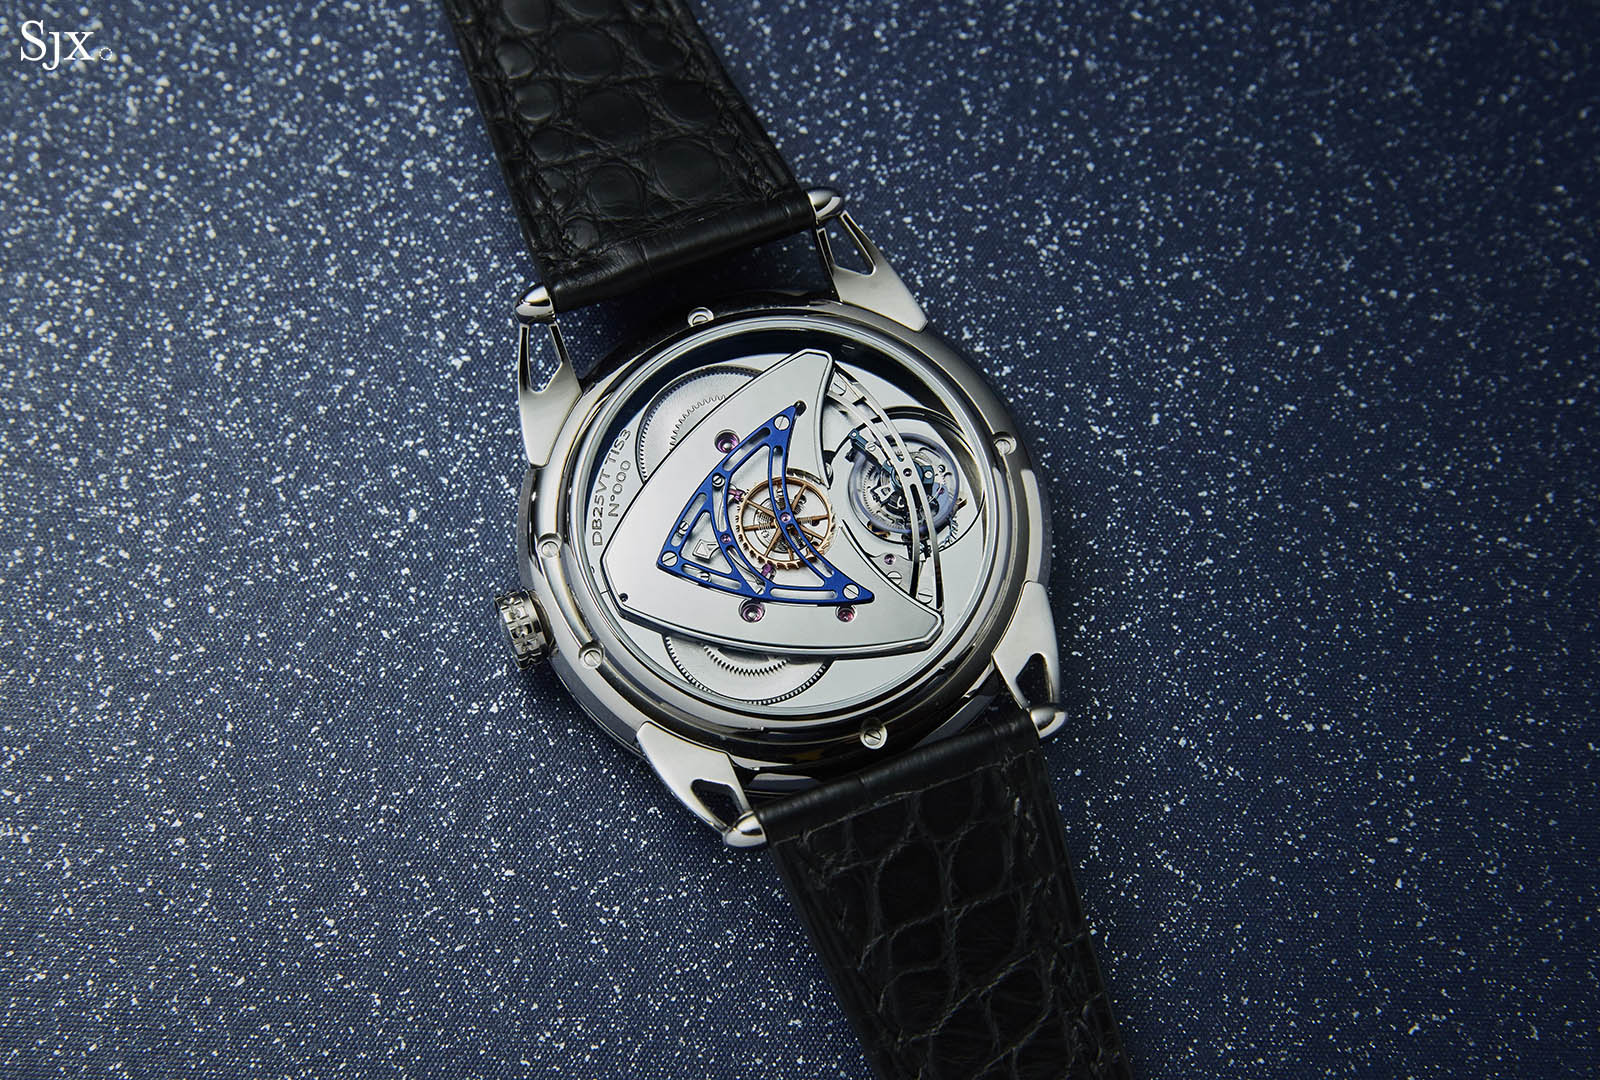 De Bethune DB25 Starry Varius Chronomètre Tourbillon_2